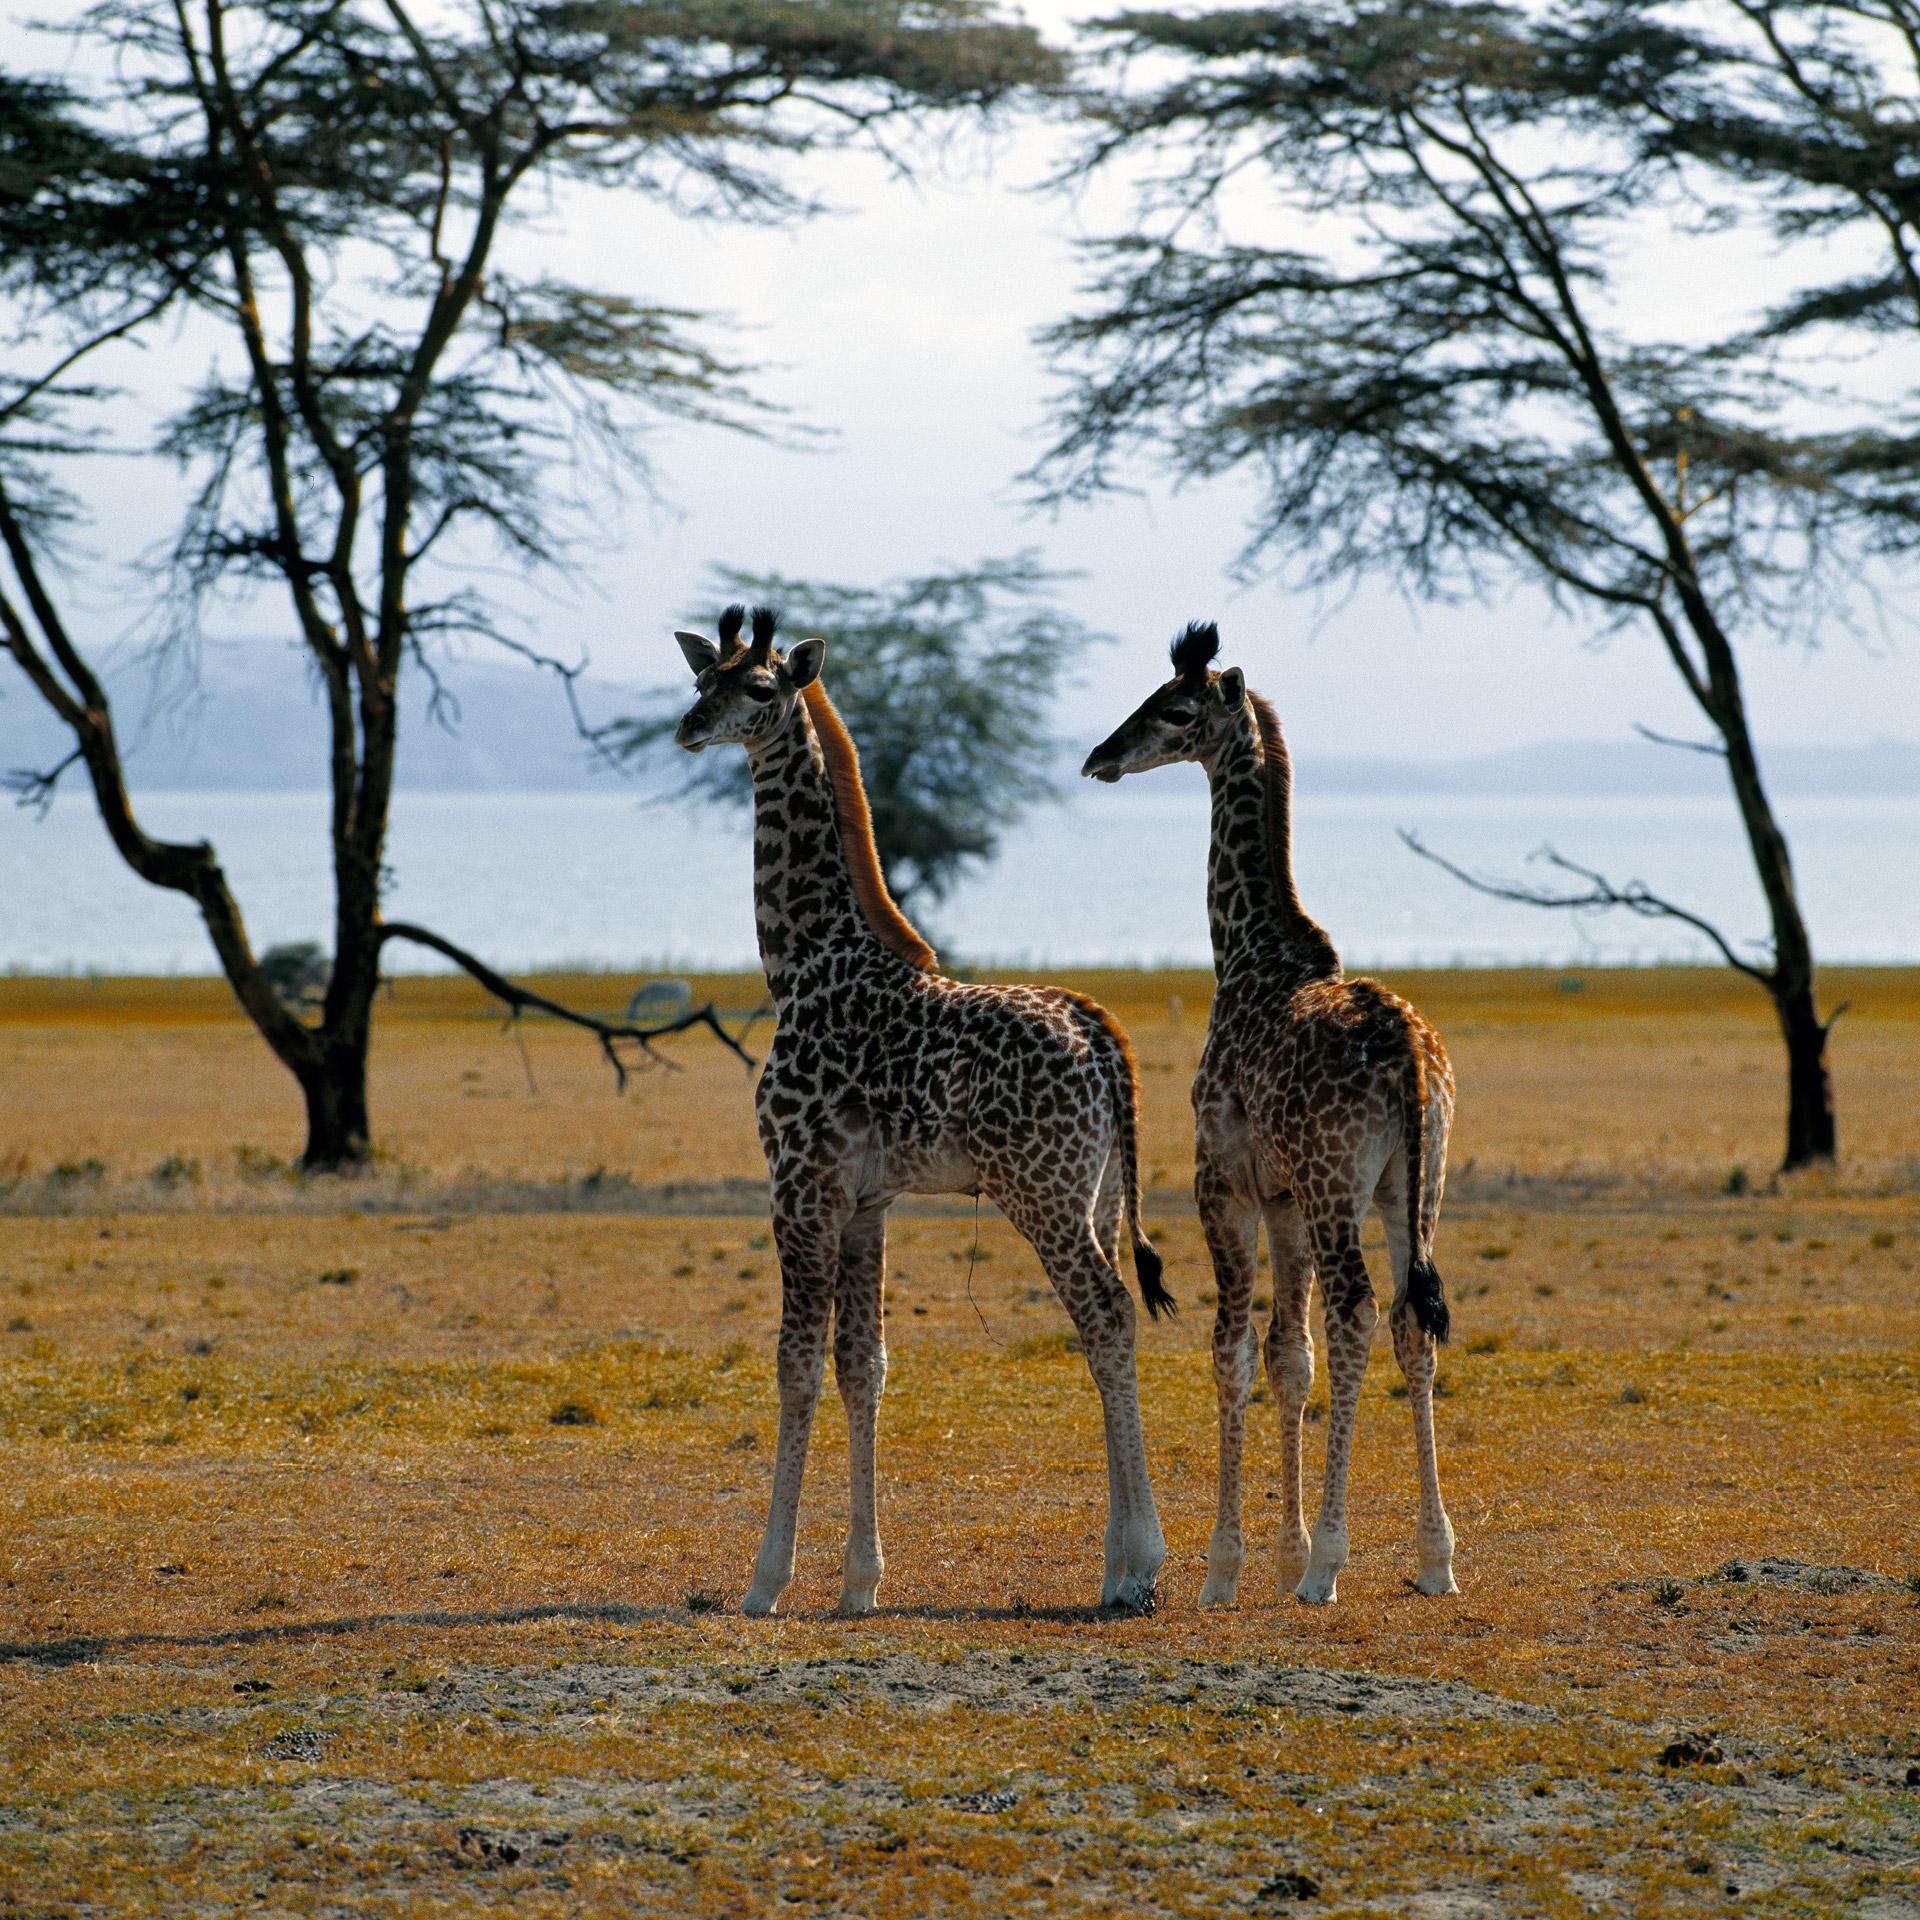 Two newly born giraffes on Crescent Island in Lake Naivasha in Kenya